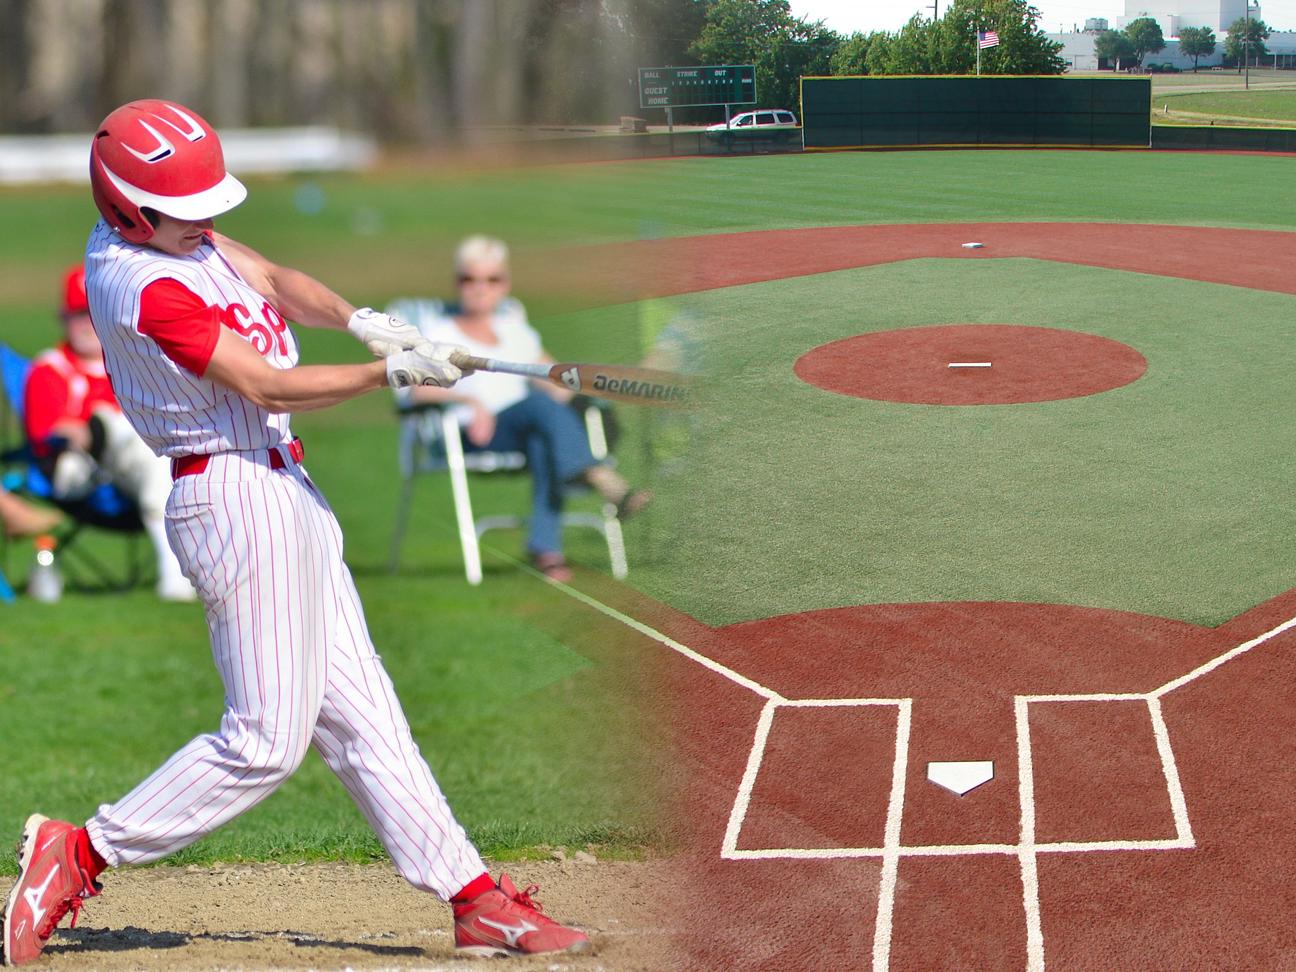 Artificial Turf is a Hit Among High School Baseball Teams